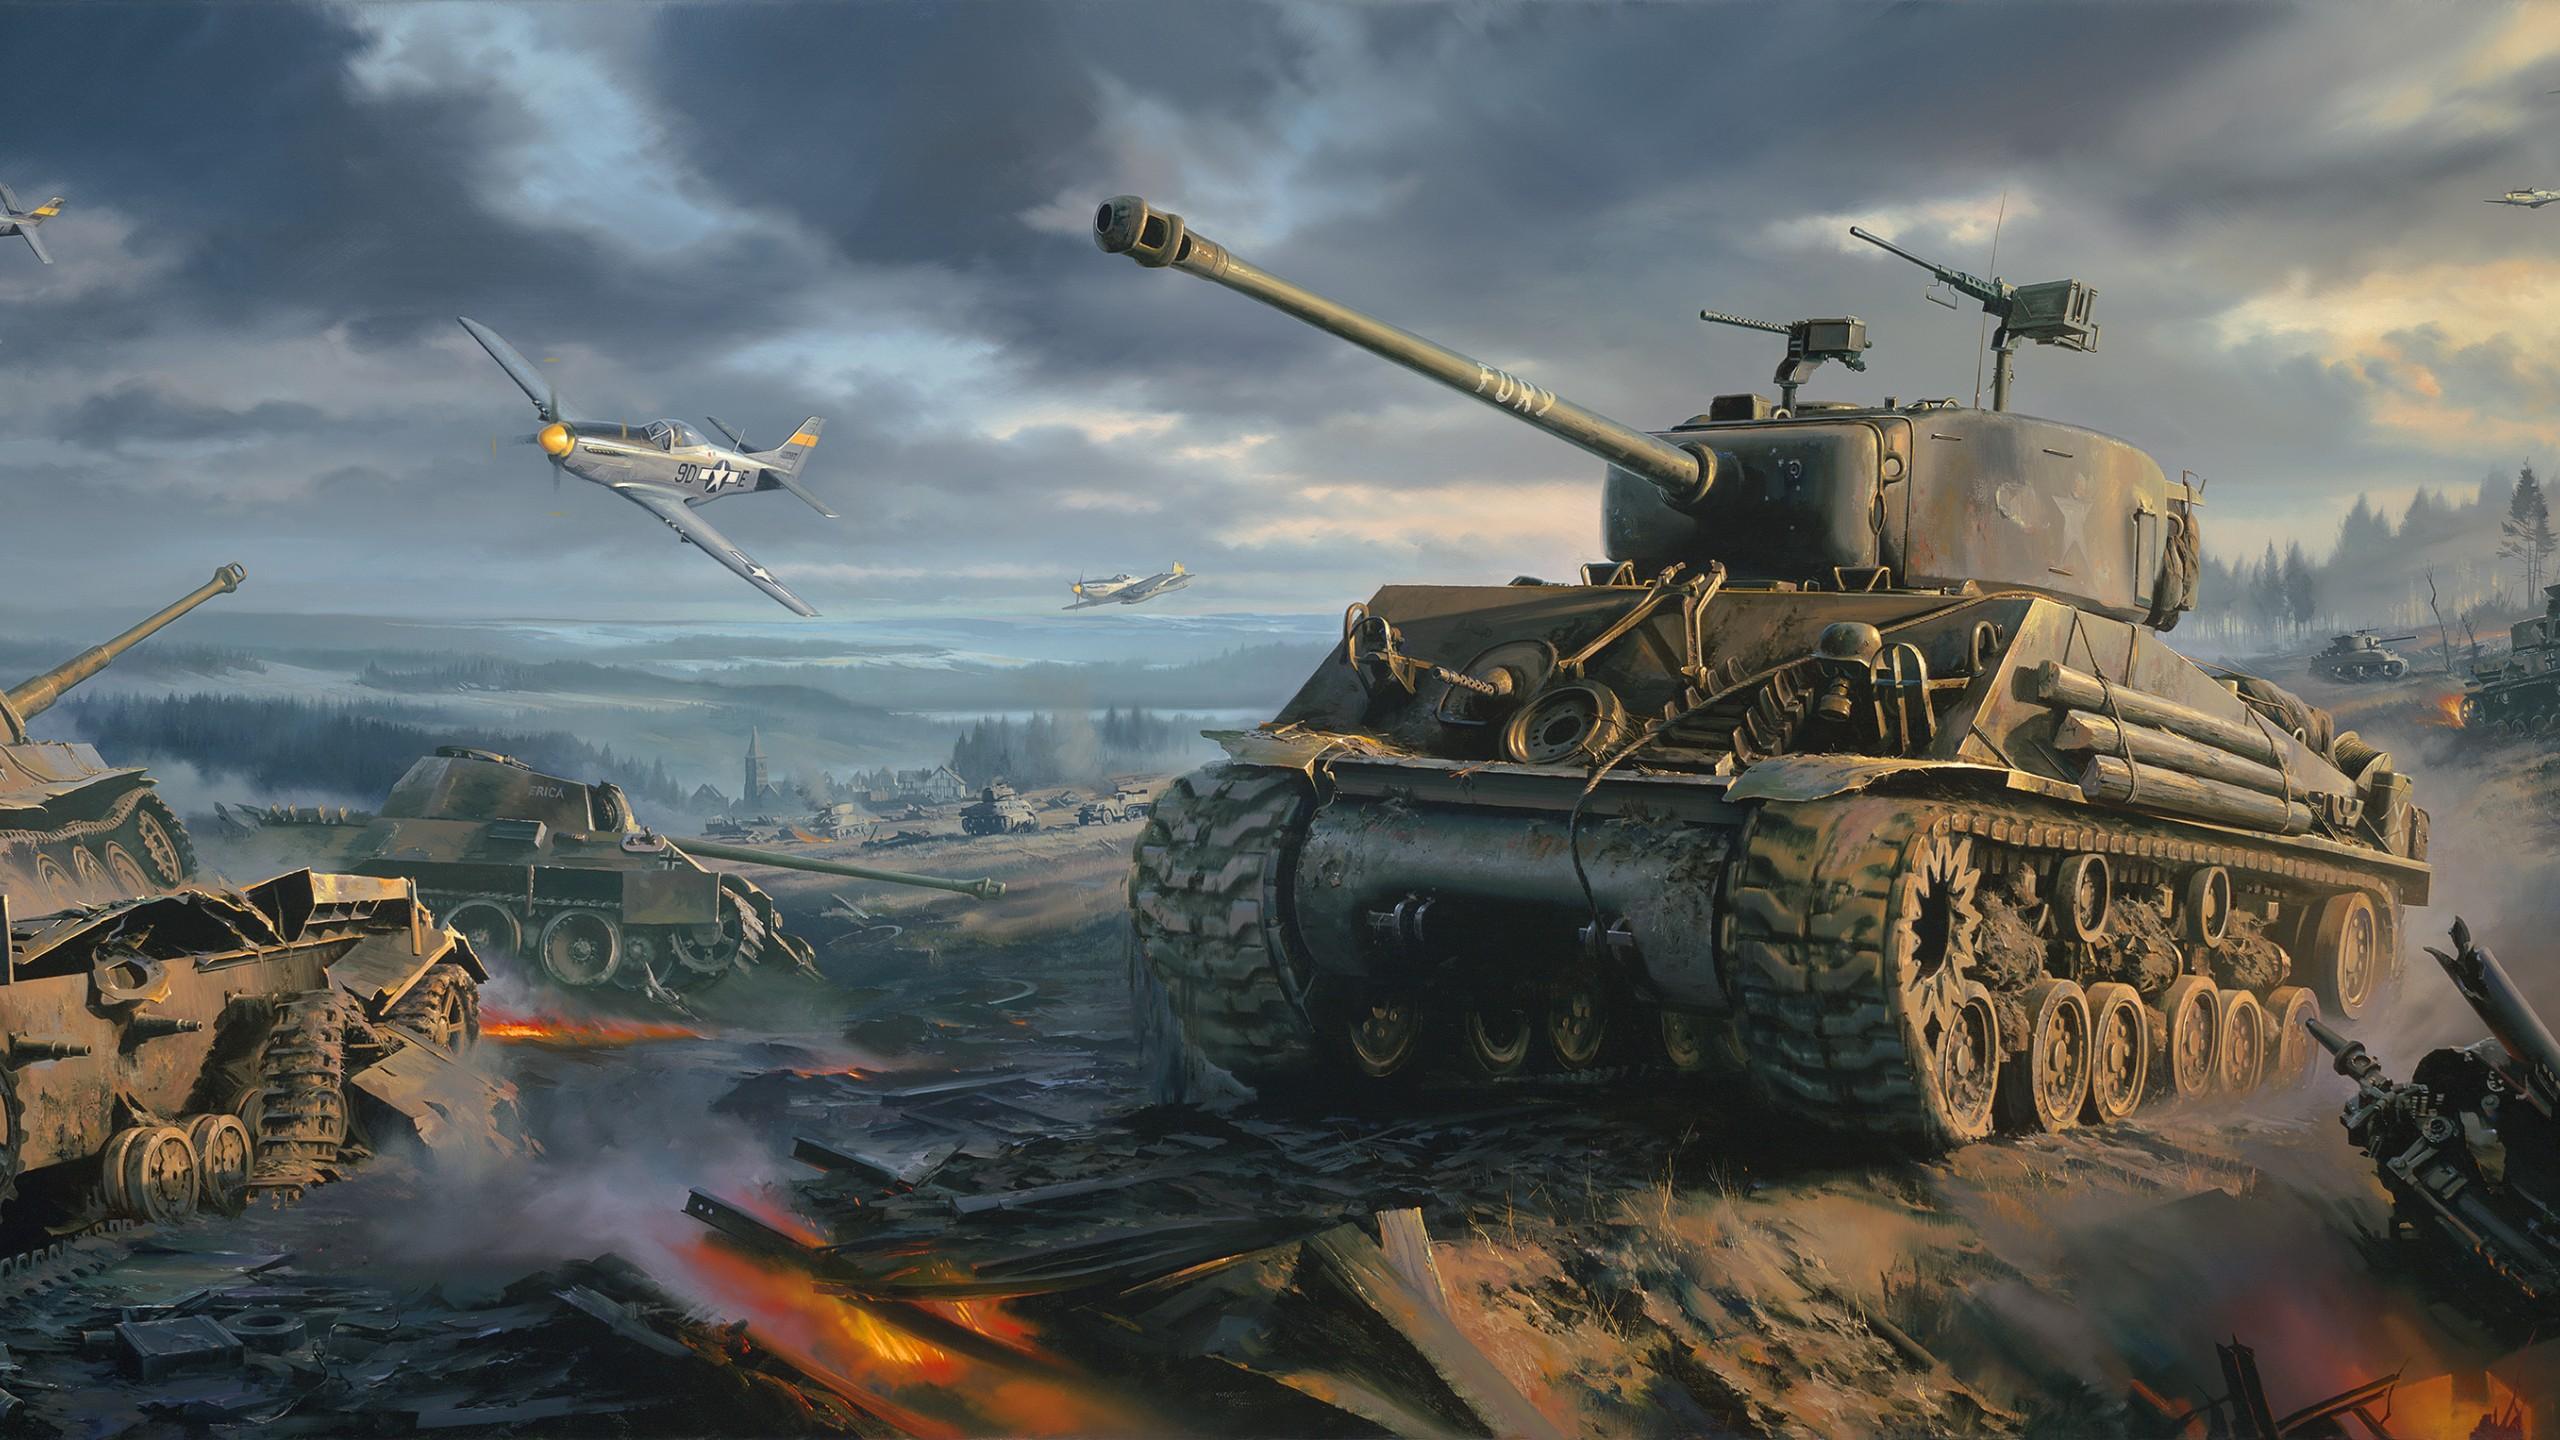 Sherman tank Wallpaper ww2 P 51 Mustang war art painting   Galaxy 2560x1440